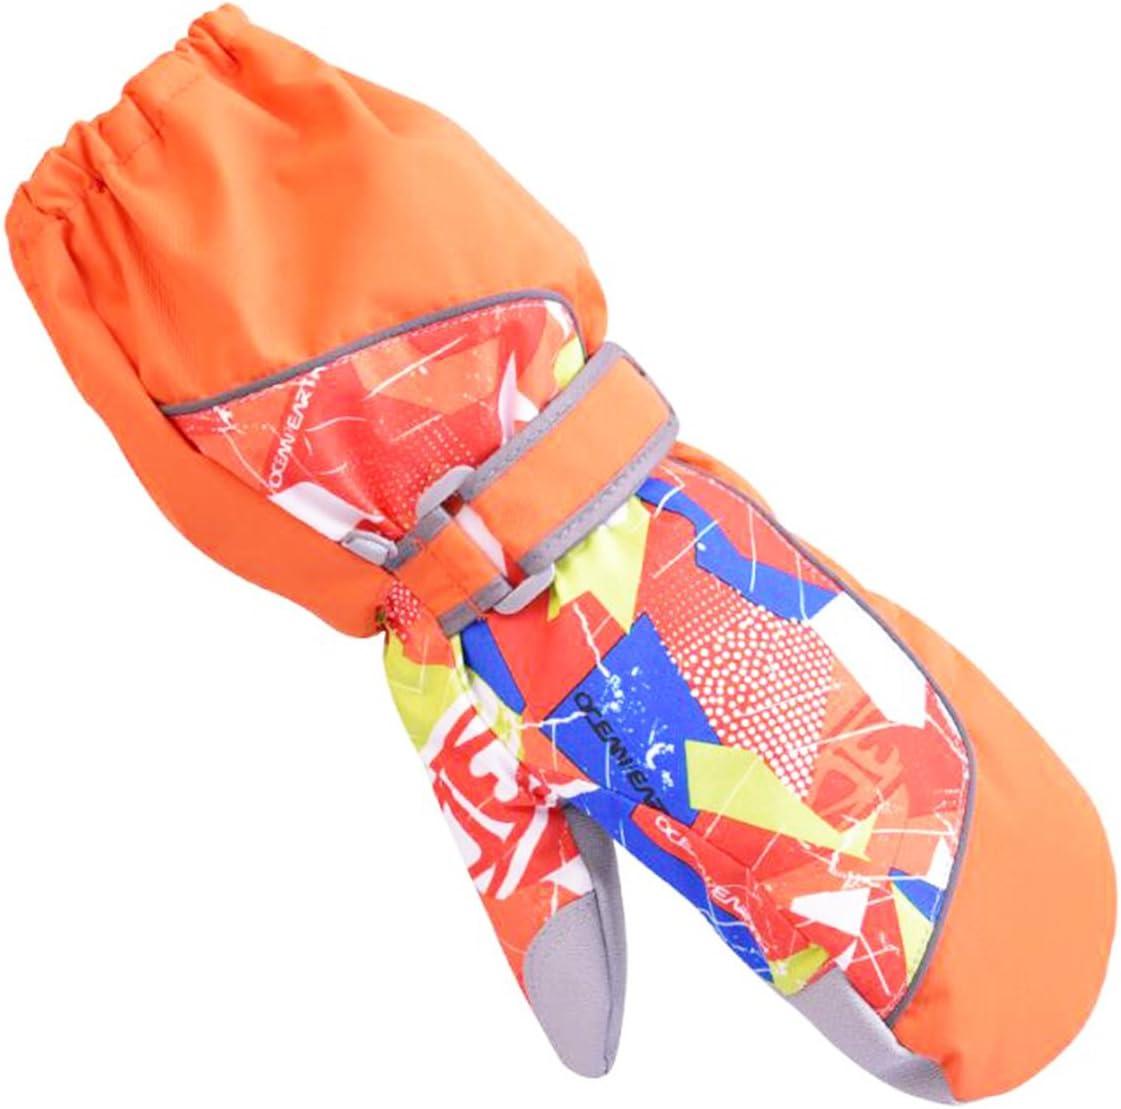 YAPJEB Kids Ski Mitten Waterproof Winter Gloves Mittens for Snowboarding Skating